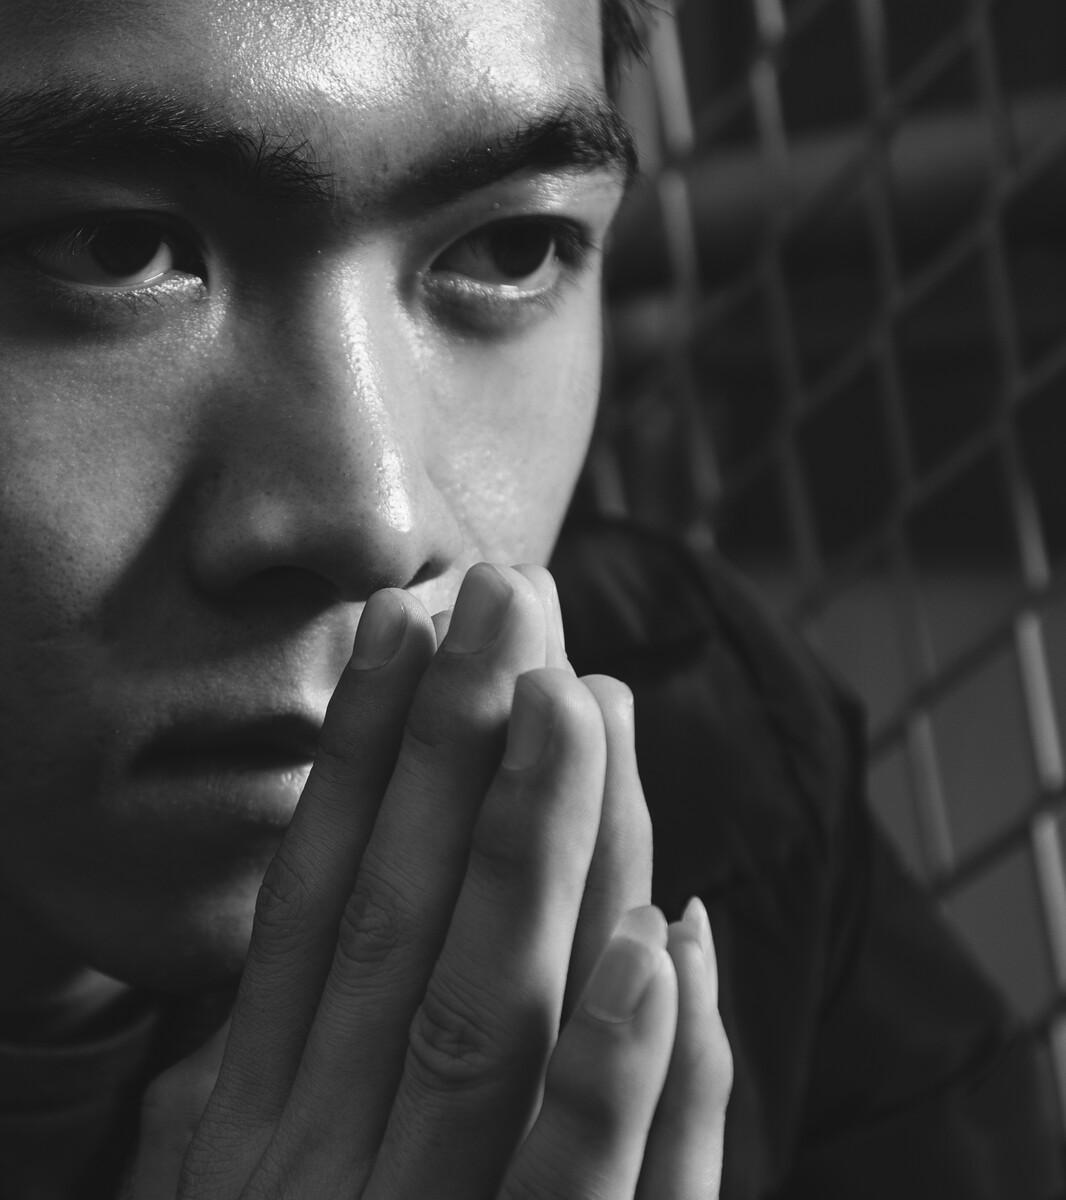 uu球直播下载-CM朋克出席芝加哥漫展,录制UFC纪录片